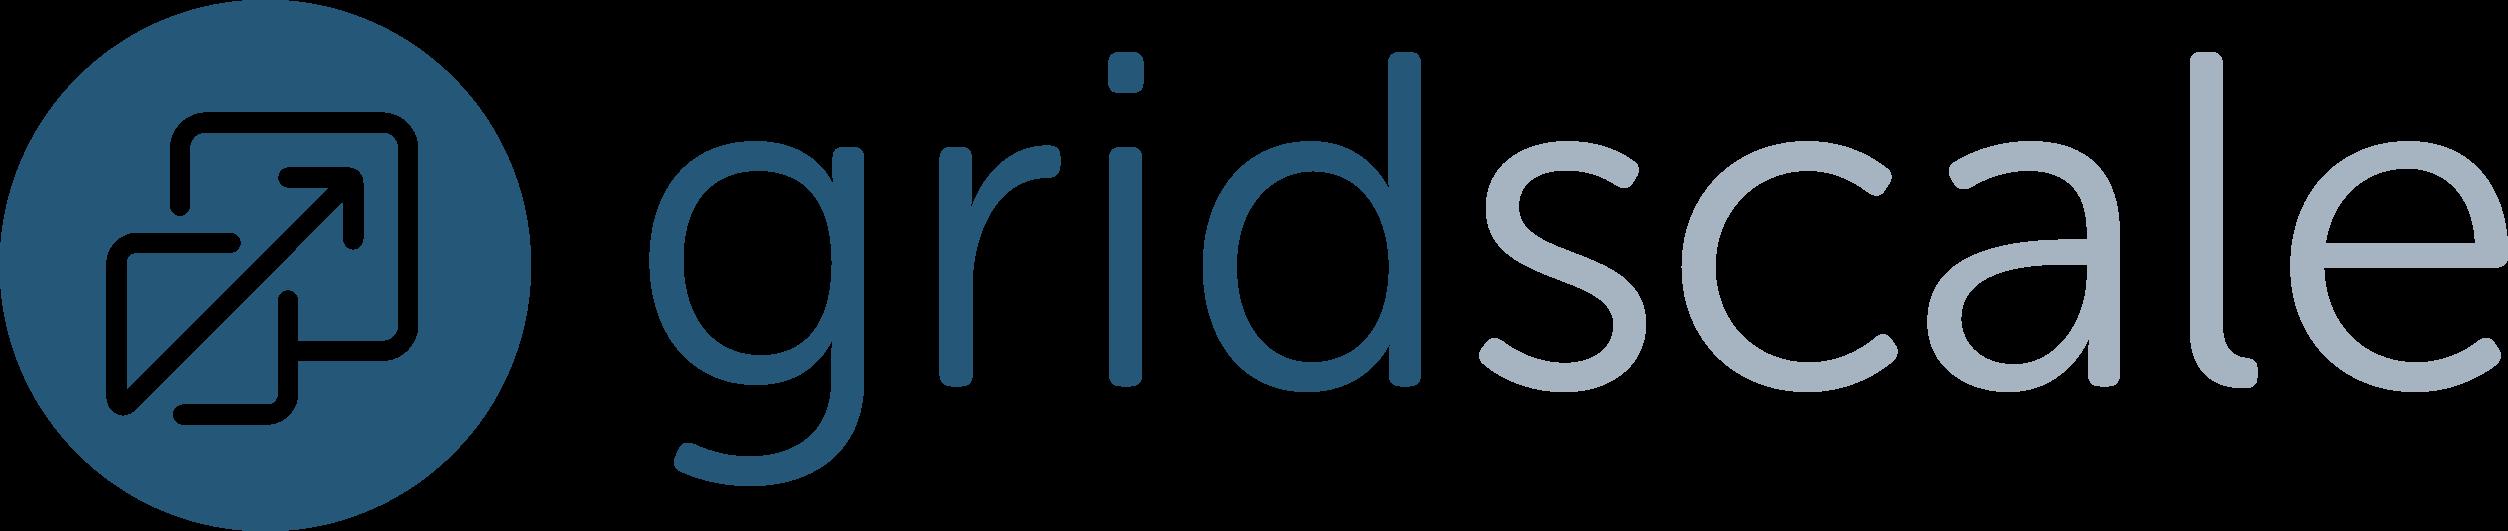 gridscale GmbH